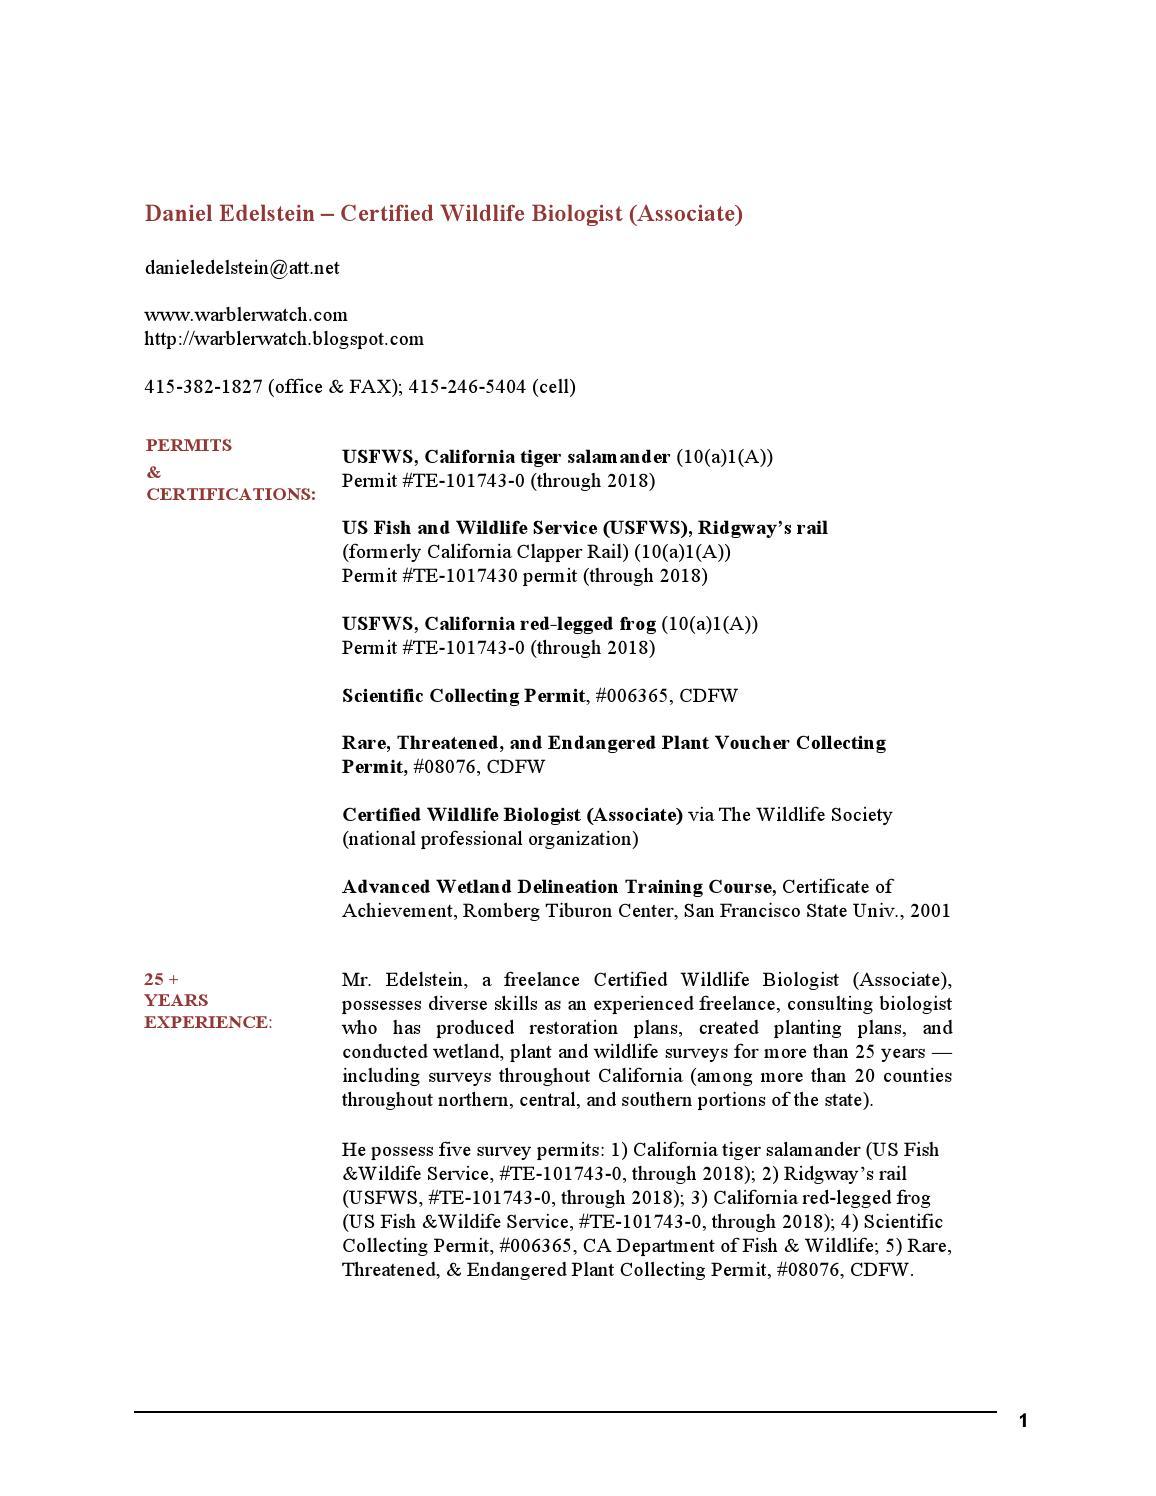 Daniel Edelstein S Certified Wildlife Biologist Associate Resume